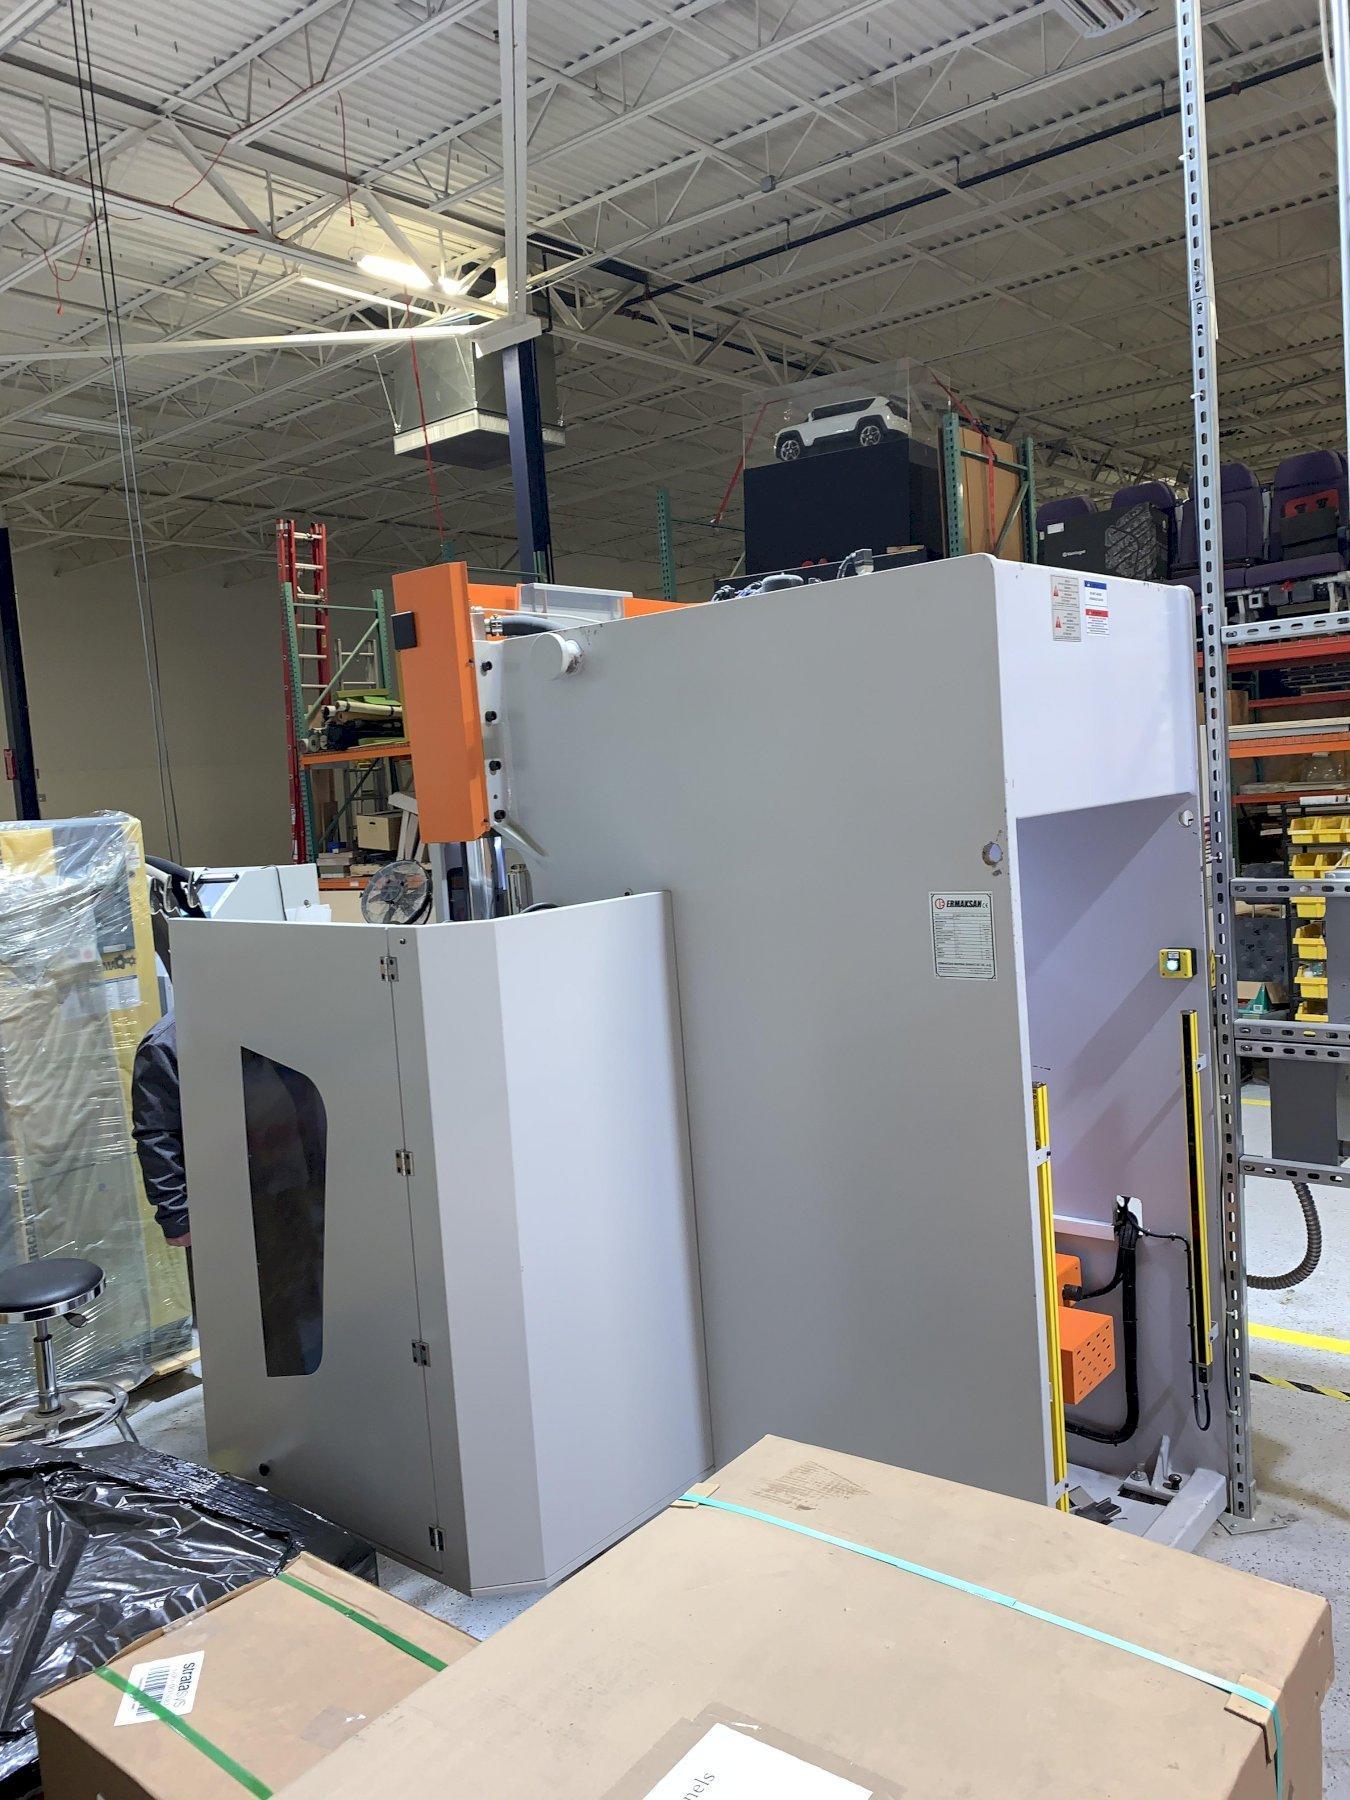 2017 mint condition Ermak 66 ton 6' bed